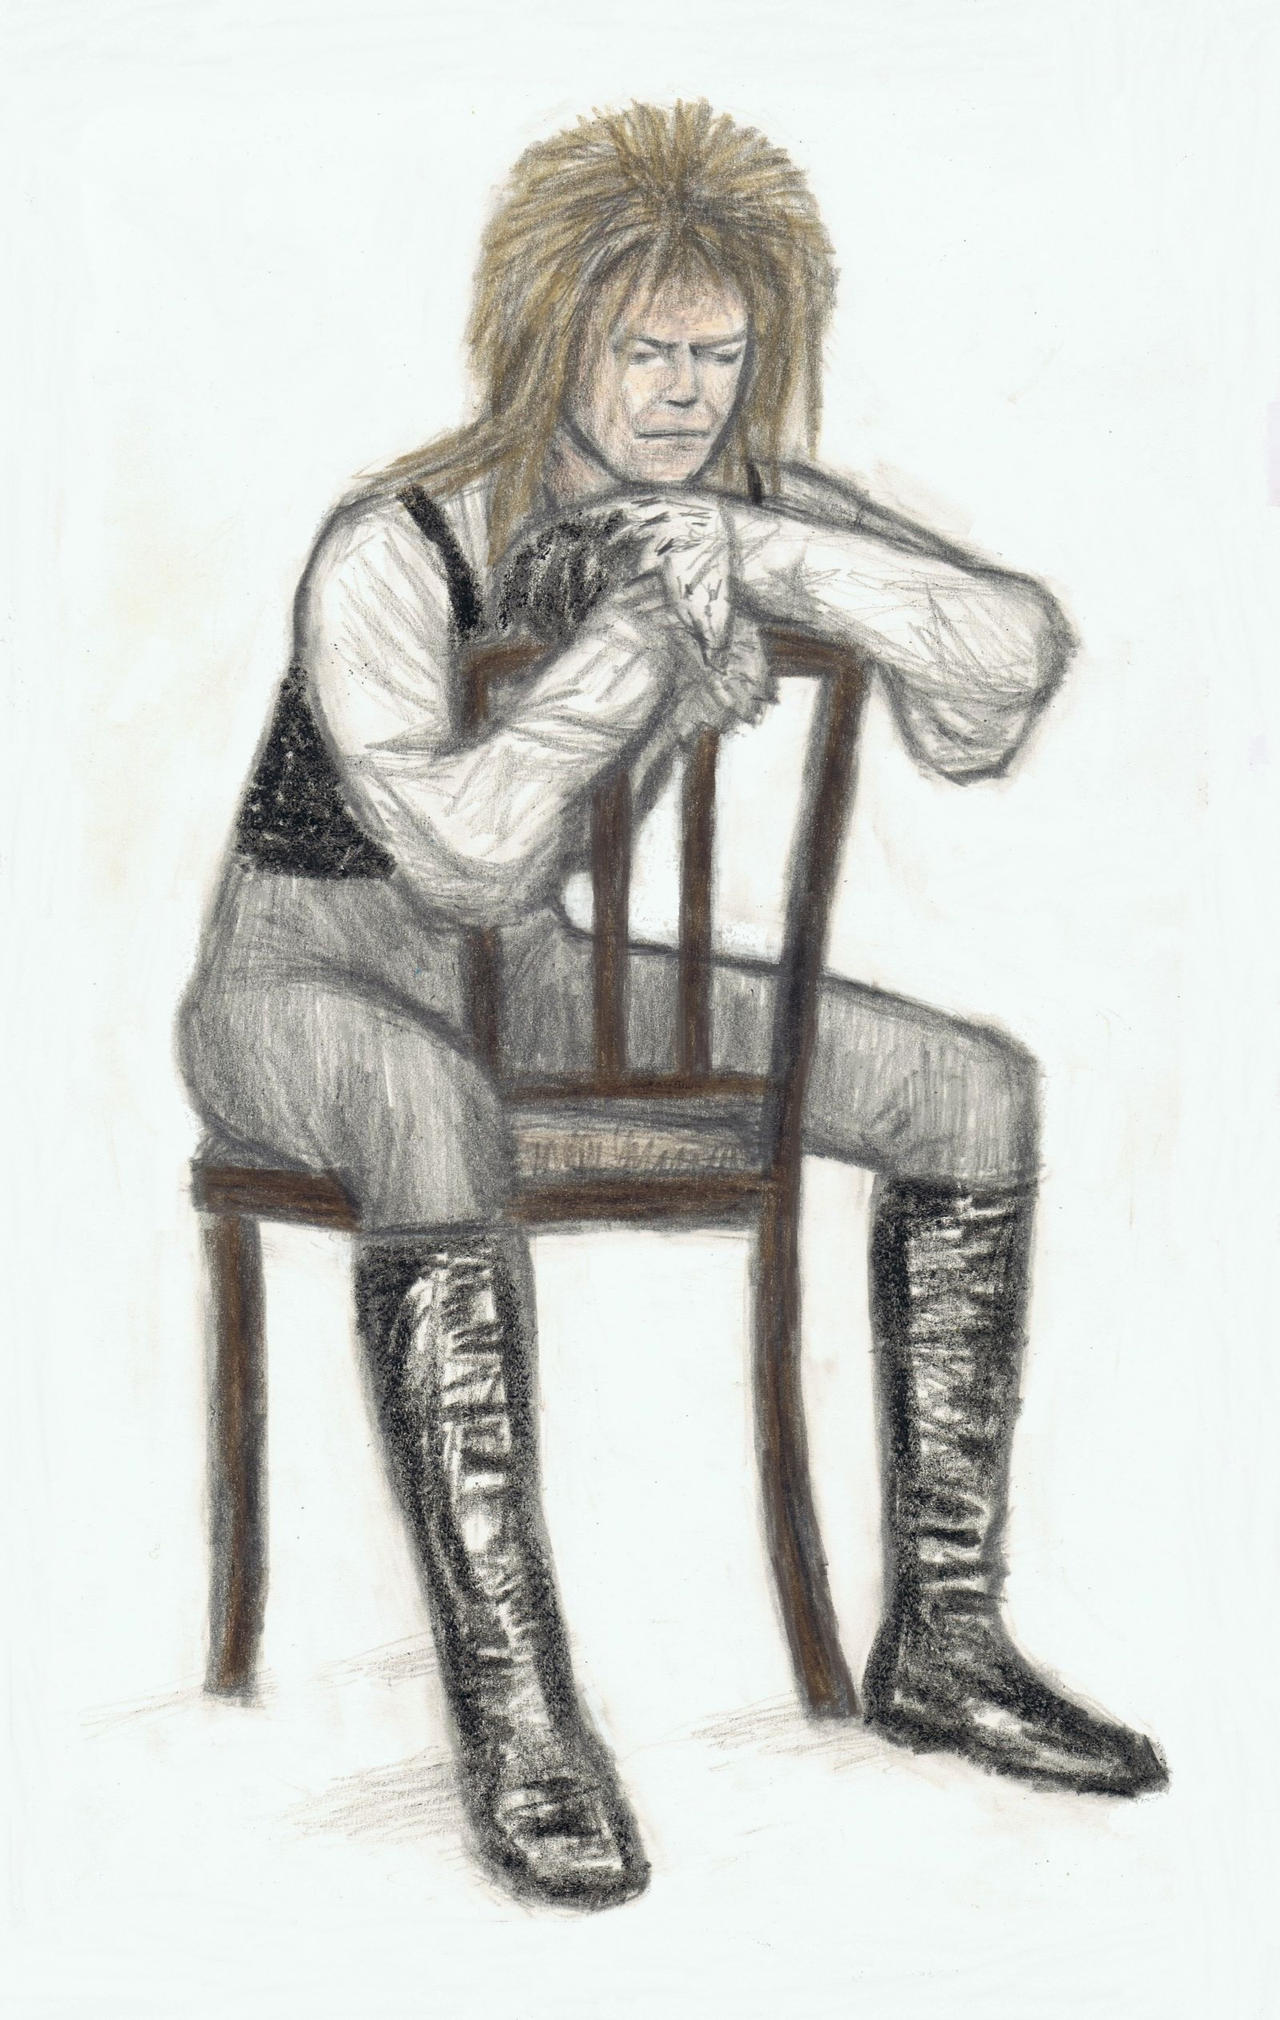 King Jareth sitting on a plain chair by gagambo